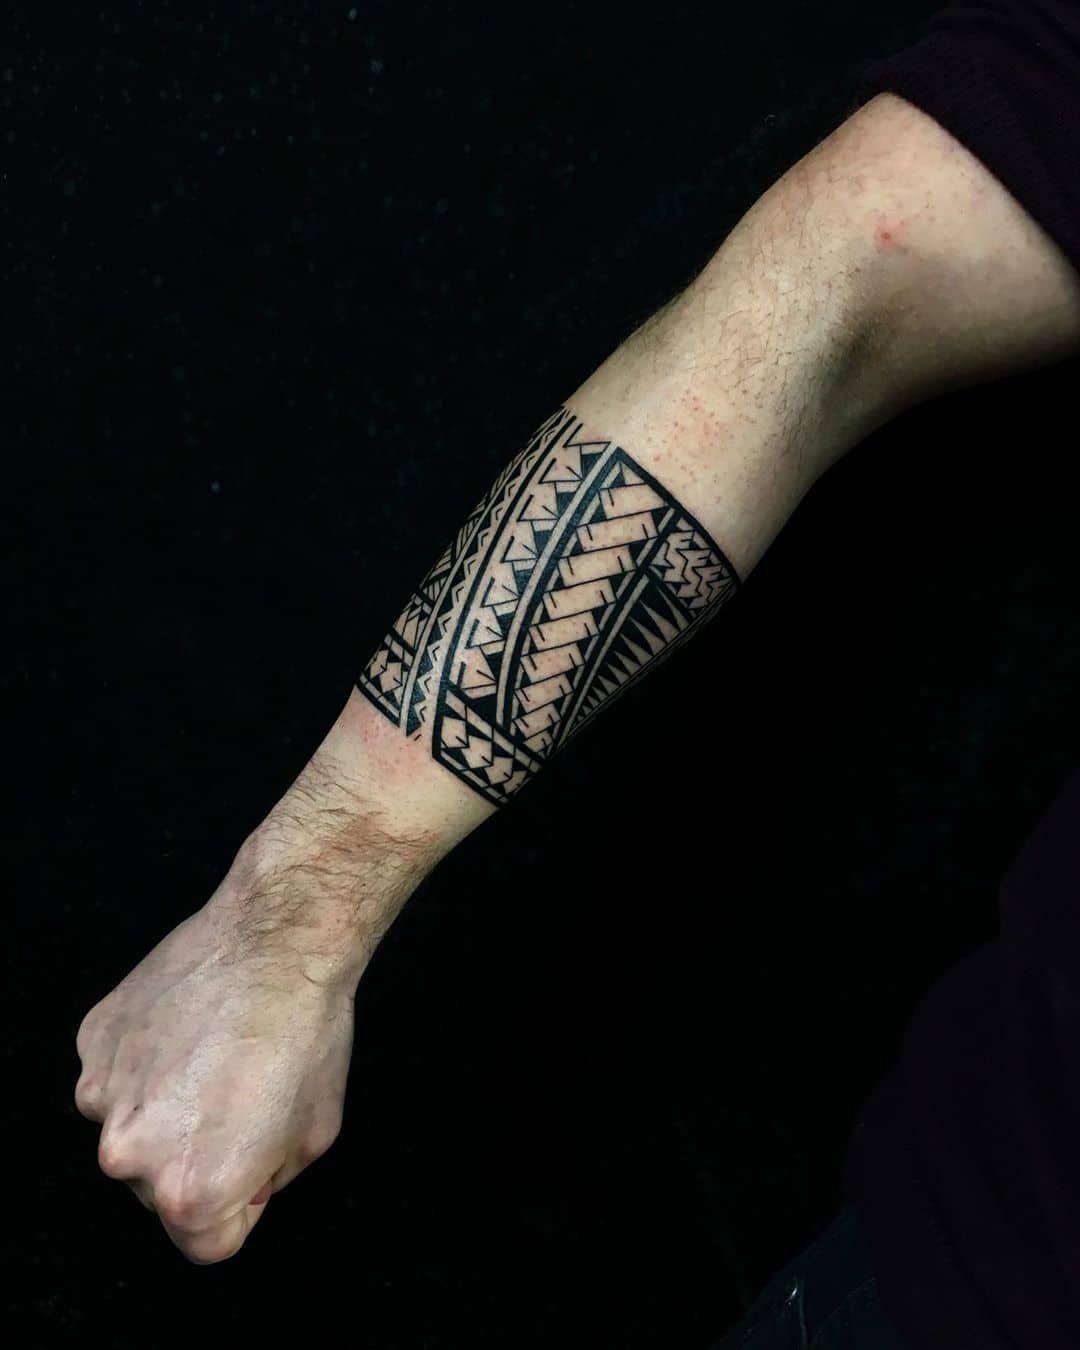 Samoan Wrist Tattoo : samoan, wrist, tattoo, Tattoo